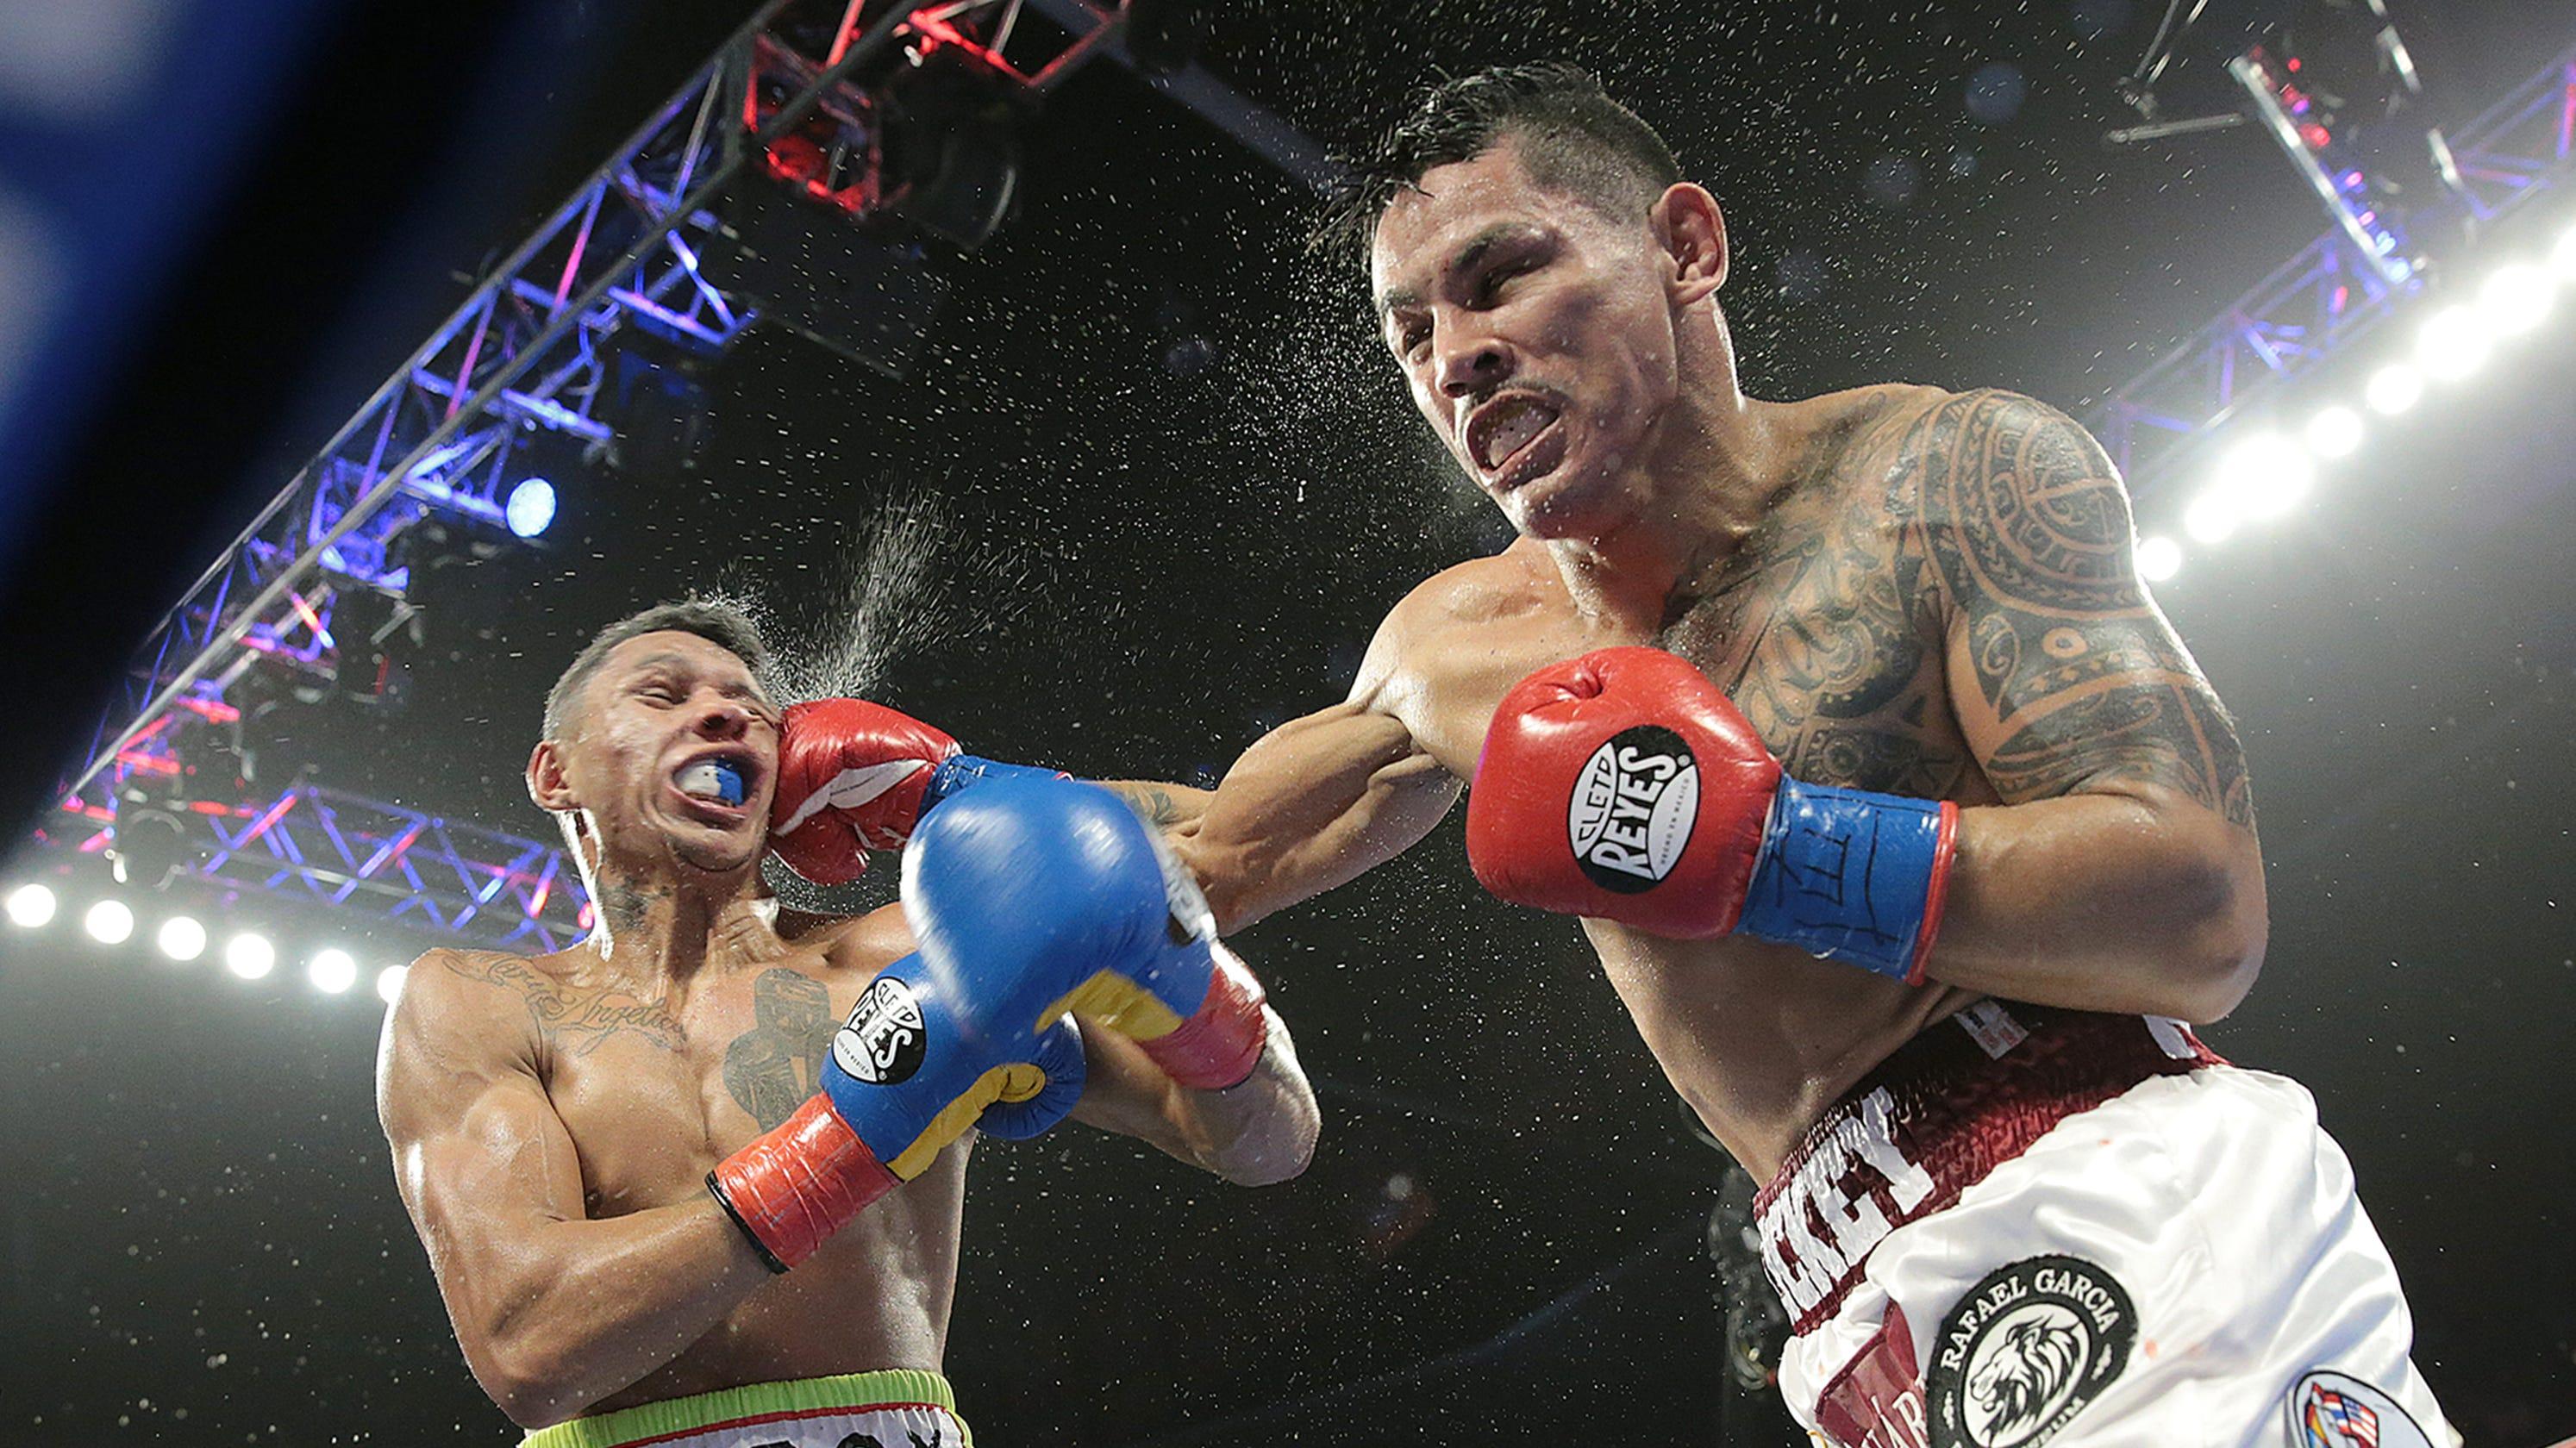 miguel berchelt defeats miguel roman in boxing championship fight